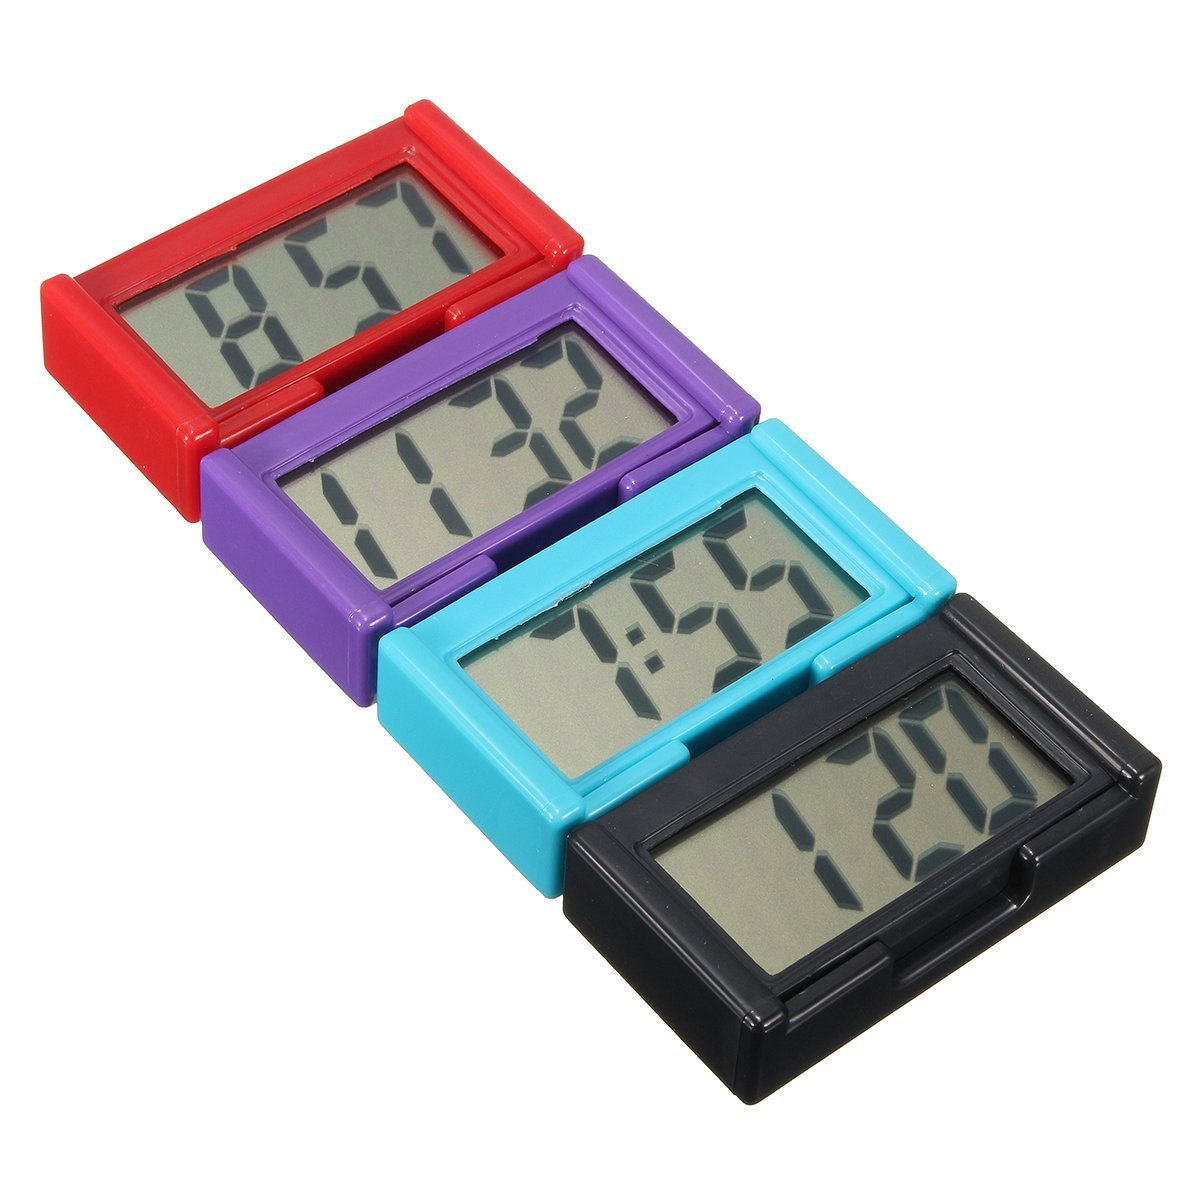 Maiile Automotive Digital Car LCD Clock Self-Adhesive Stick On Time Portabl Blue